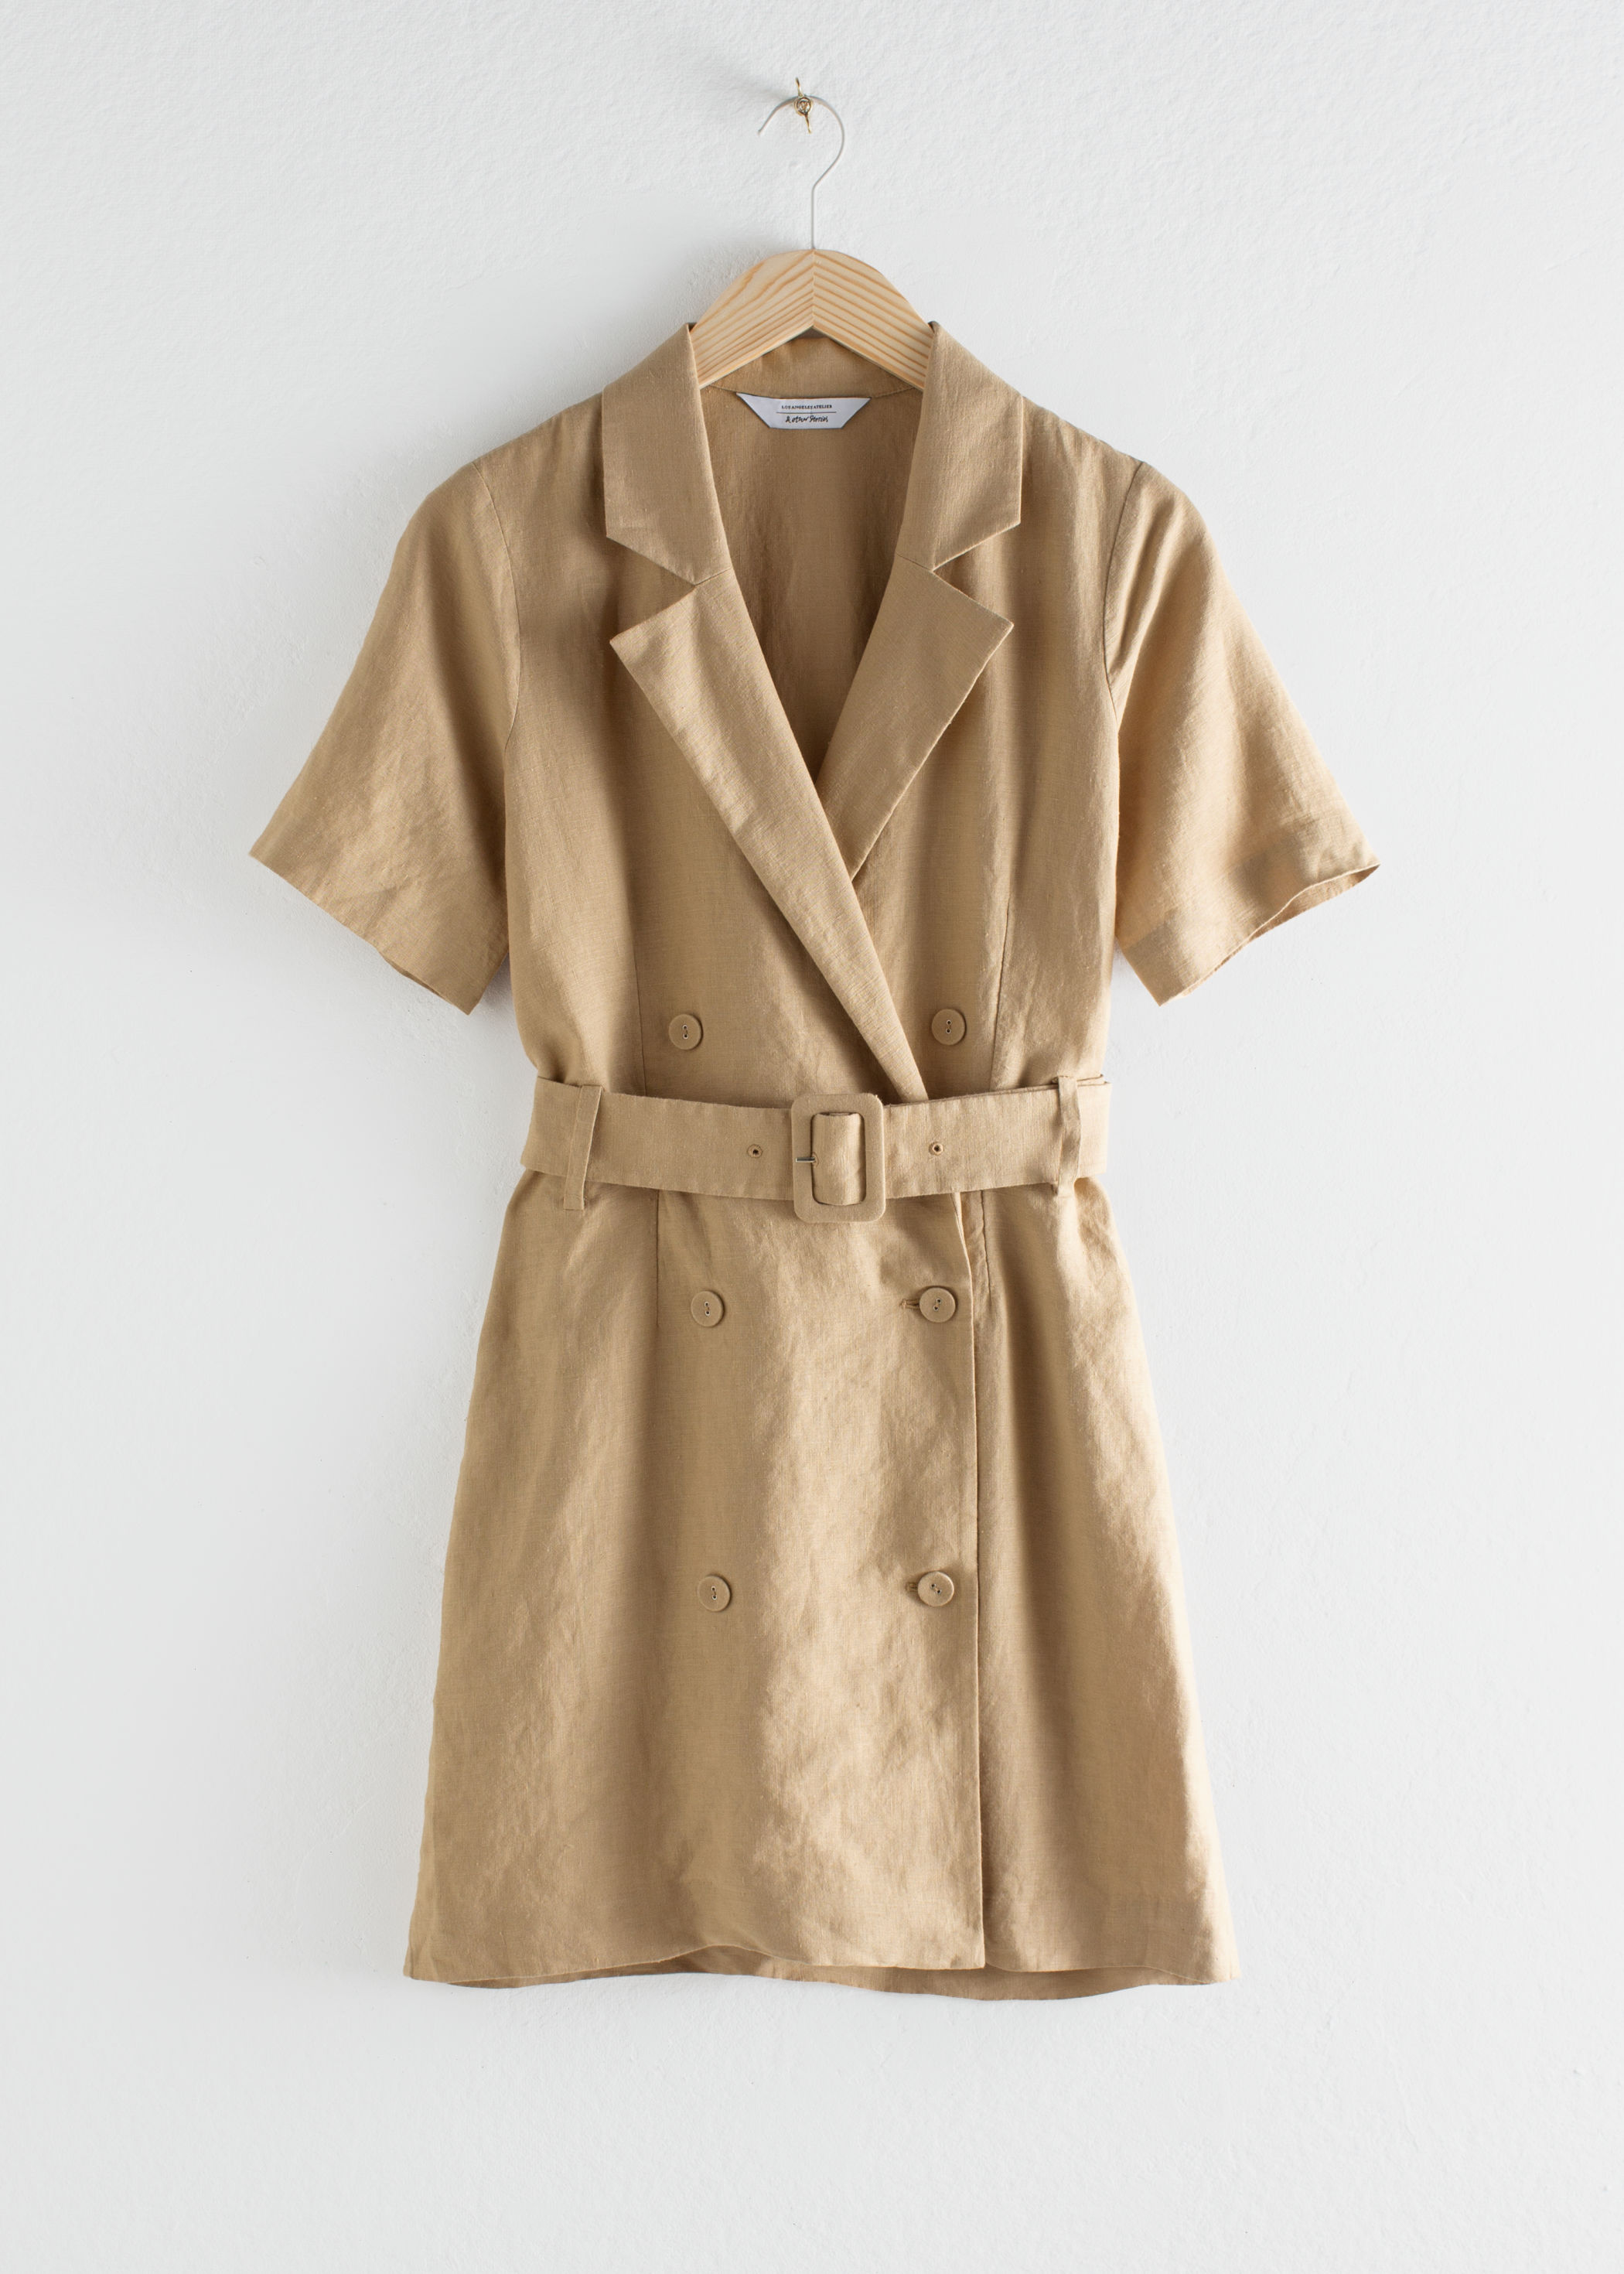 ROSE & IVY Journal The Find | A Belted Linen Dress